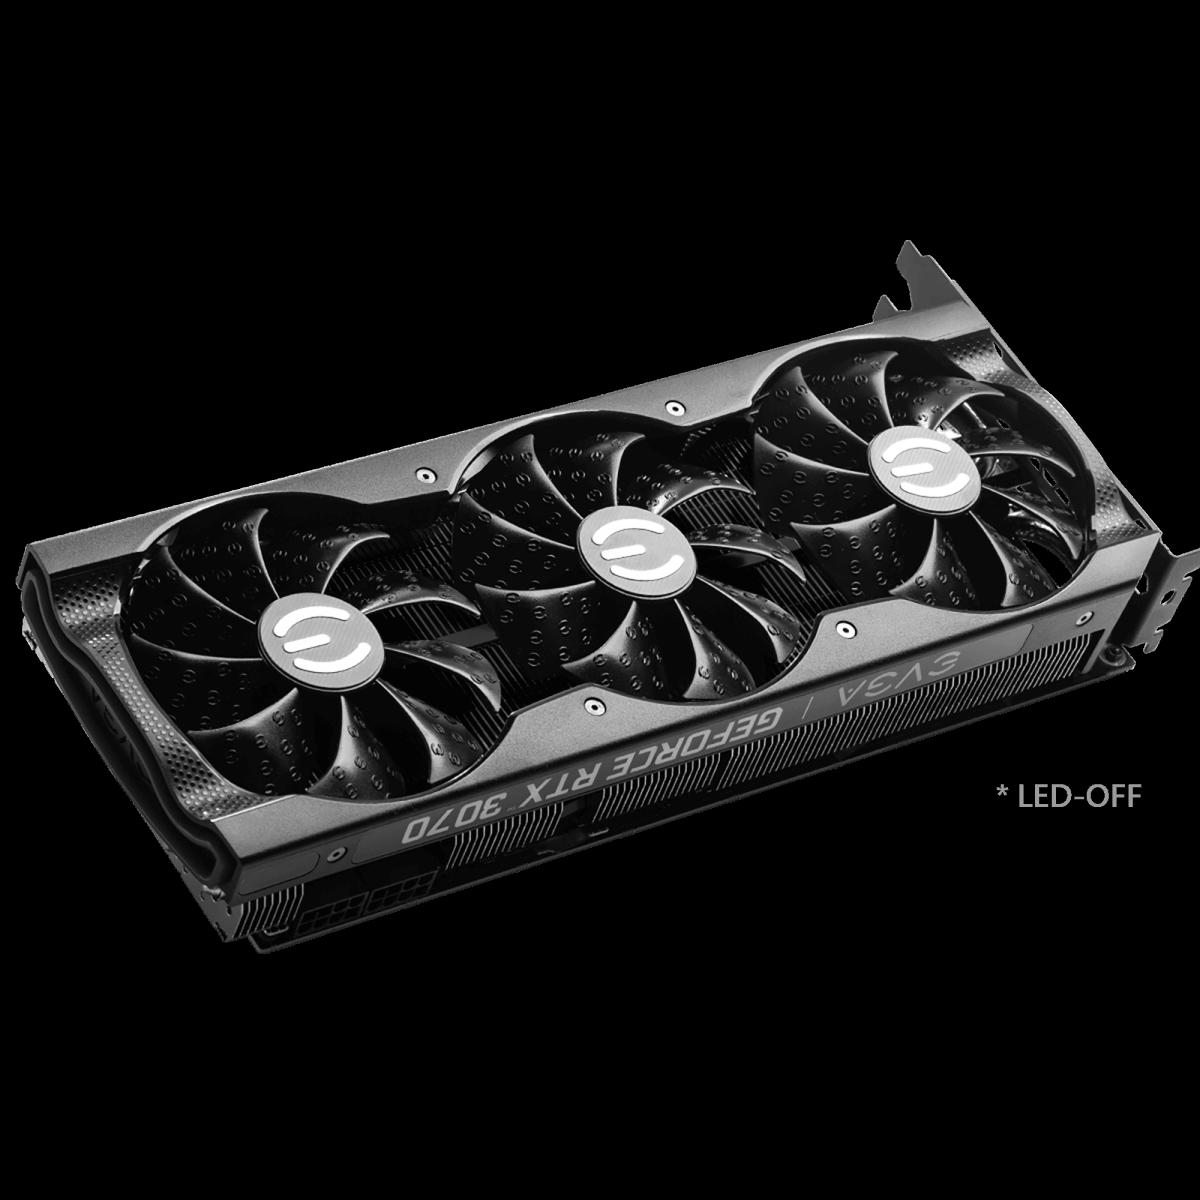 Placa de Vídeo EVGA GeForce RTX 3070 XC3 Black Gaming 8GB GDDR6 256bit 08G-P5-3751-KR